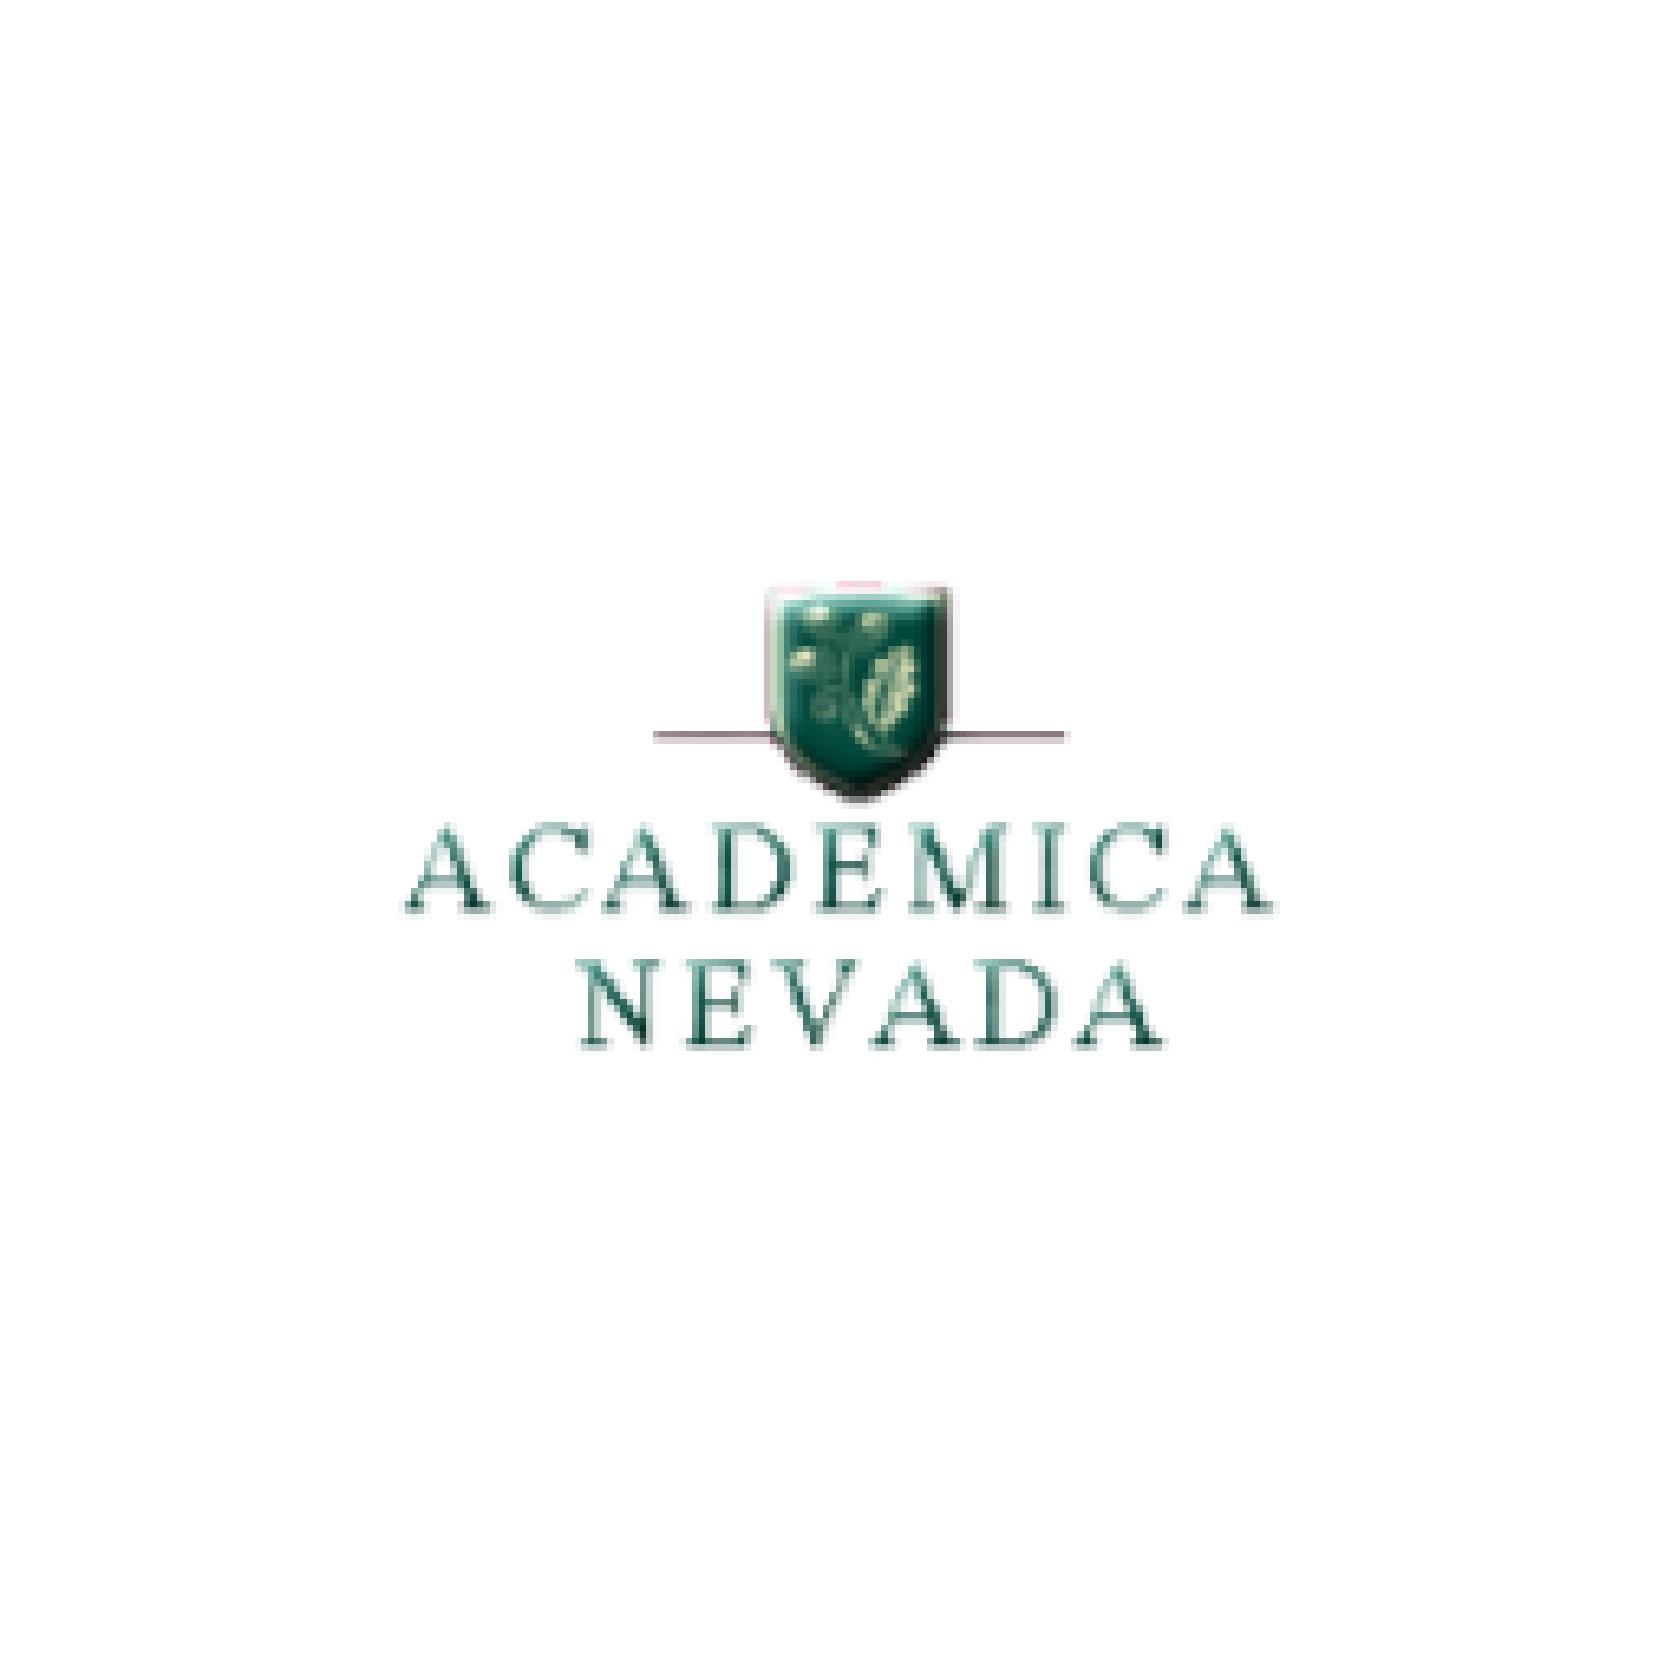 Academica Nevada